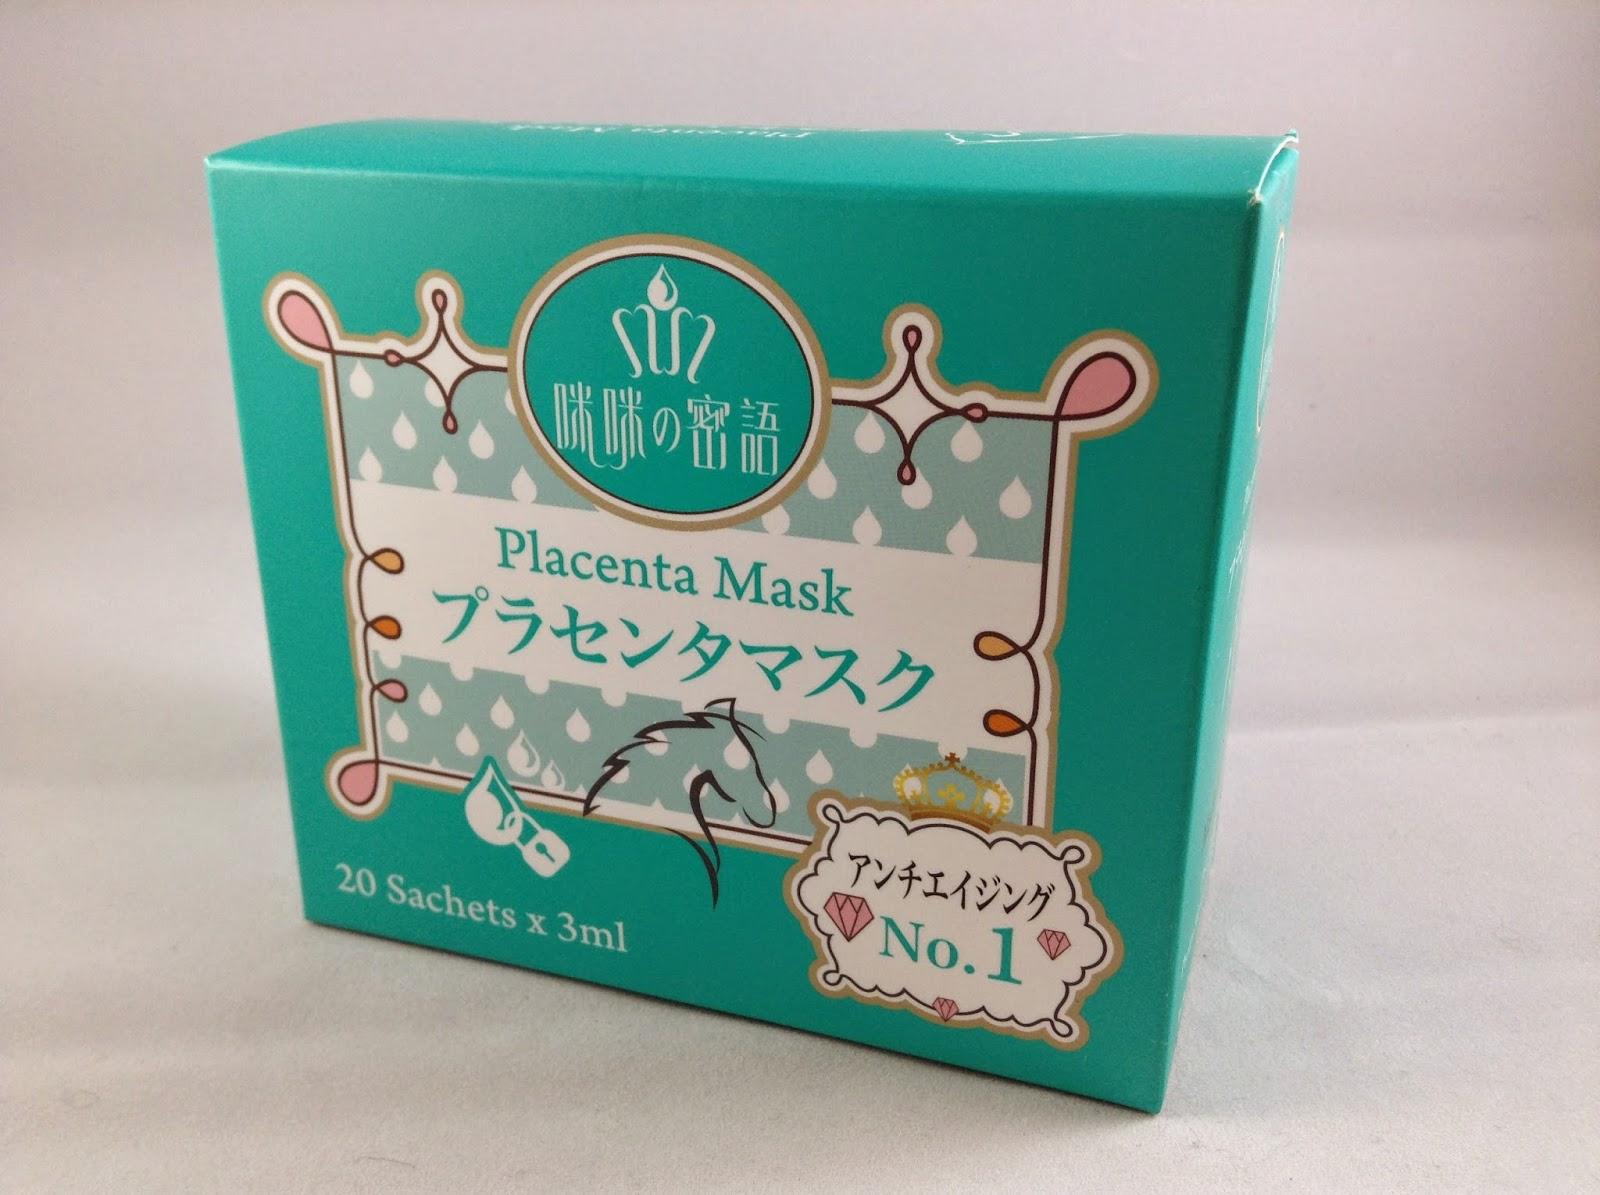 >> 睡醒擁有光澤肌*咪咪の密語 胎盤保濕水療面膜 Placenta Spa Sleeping Mask